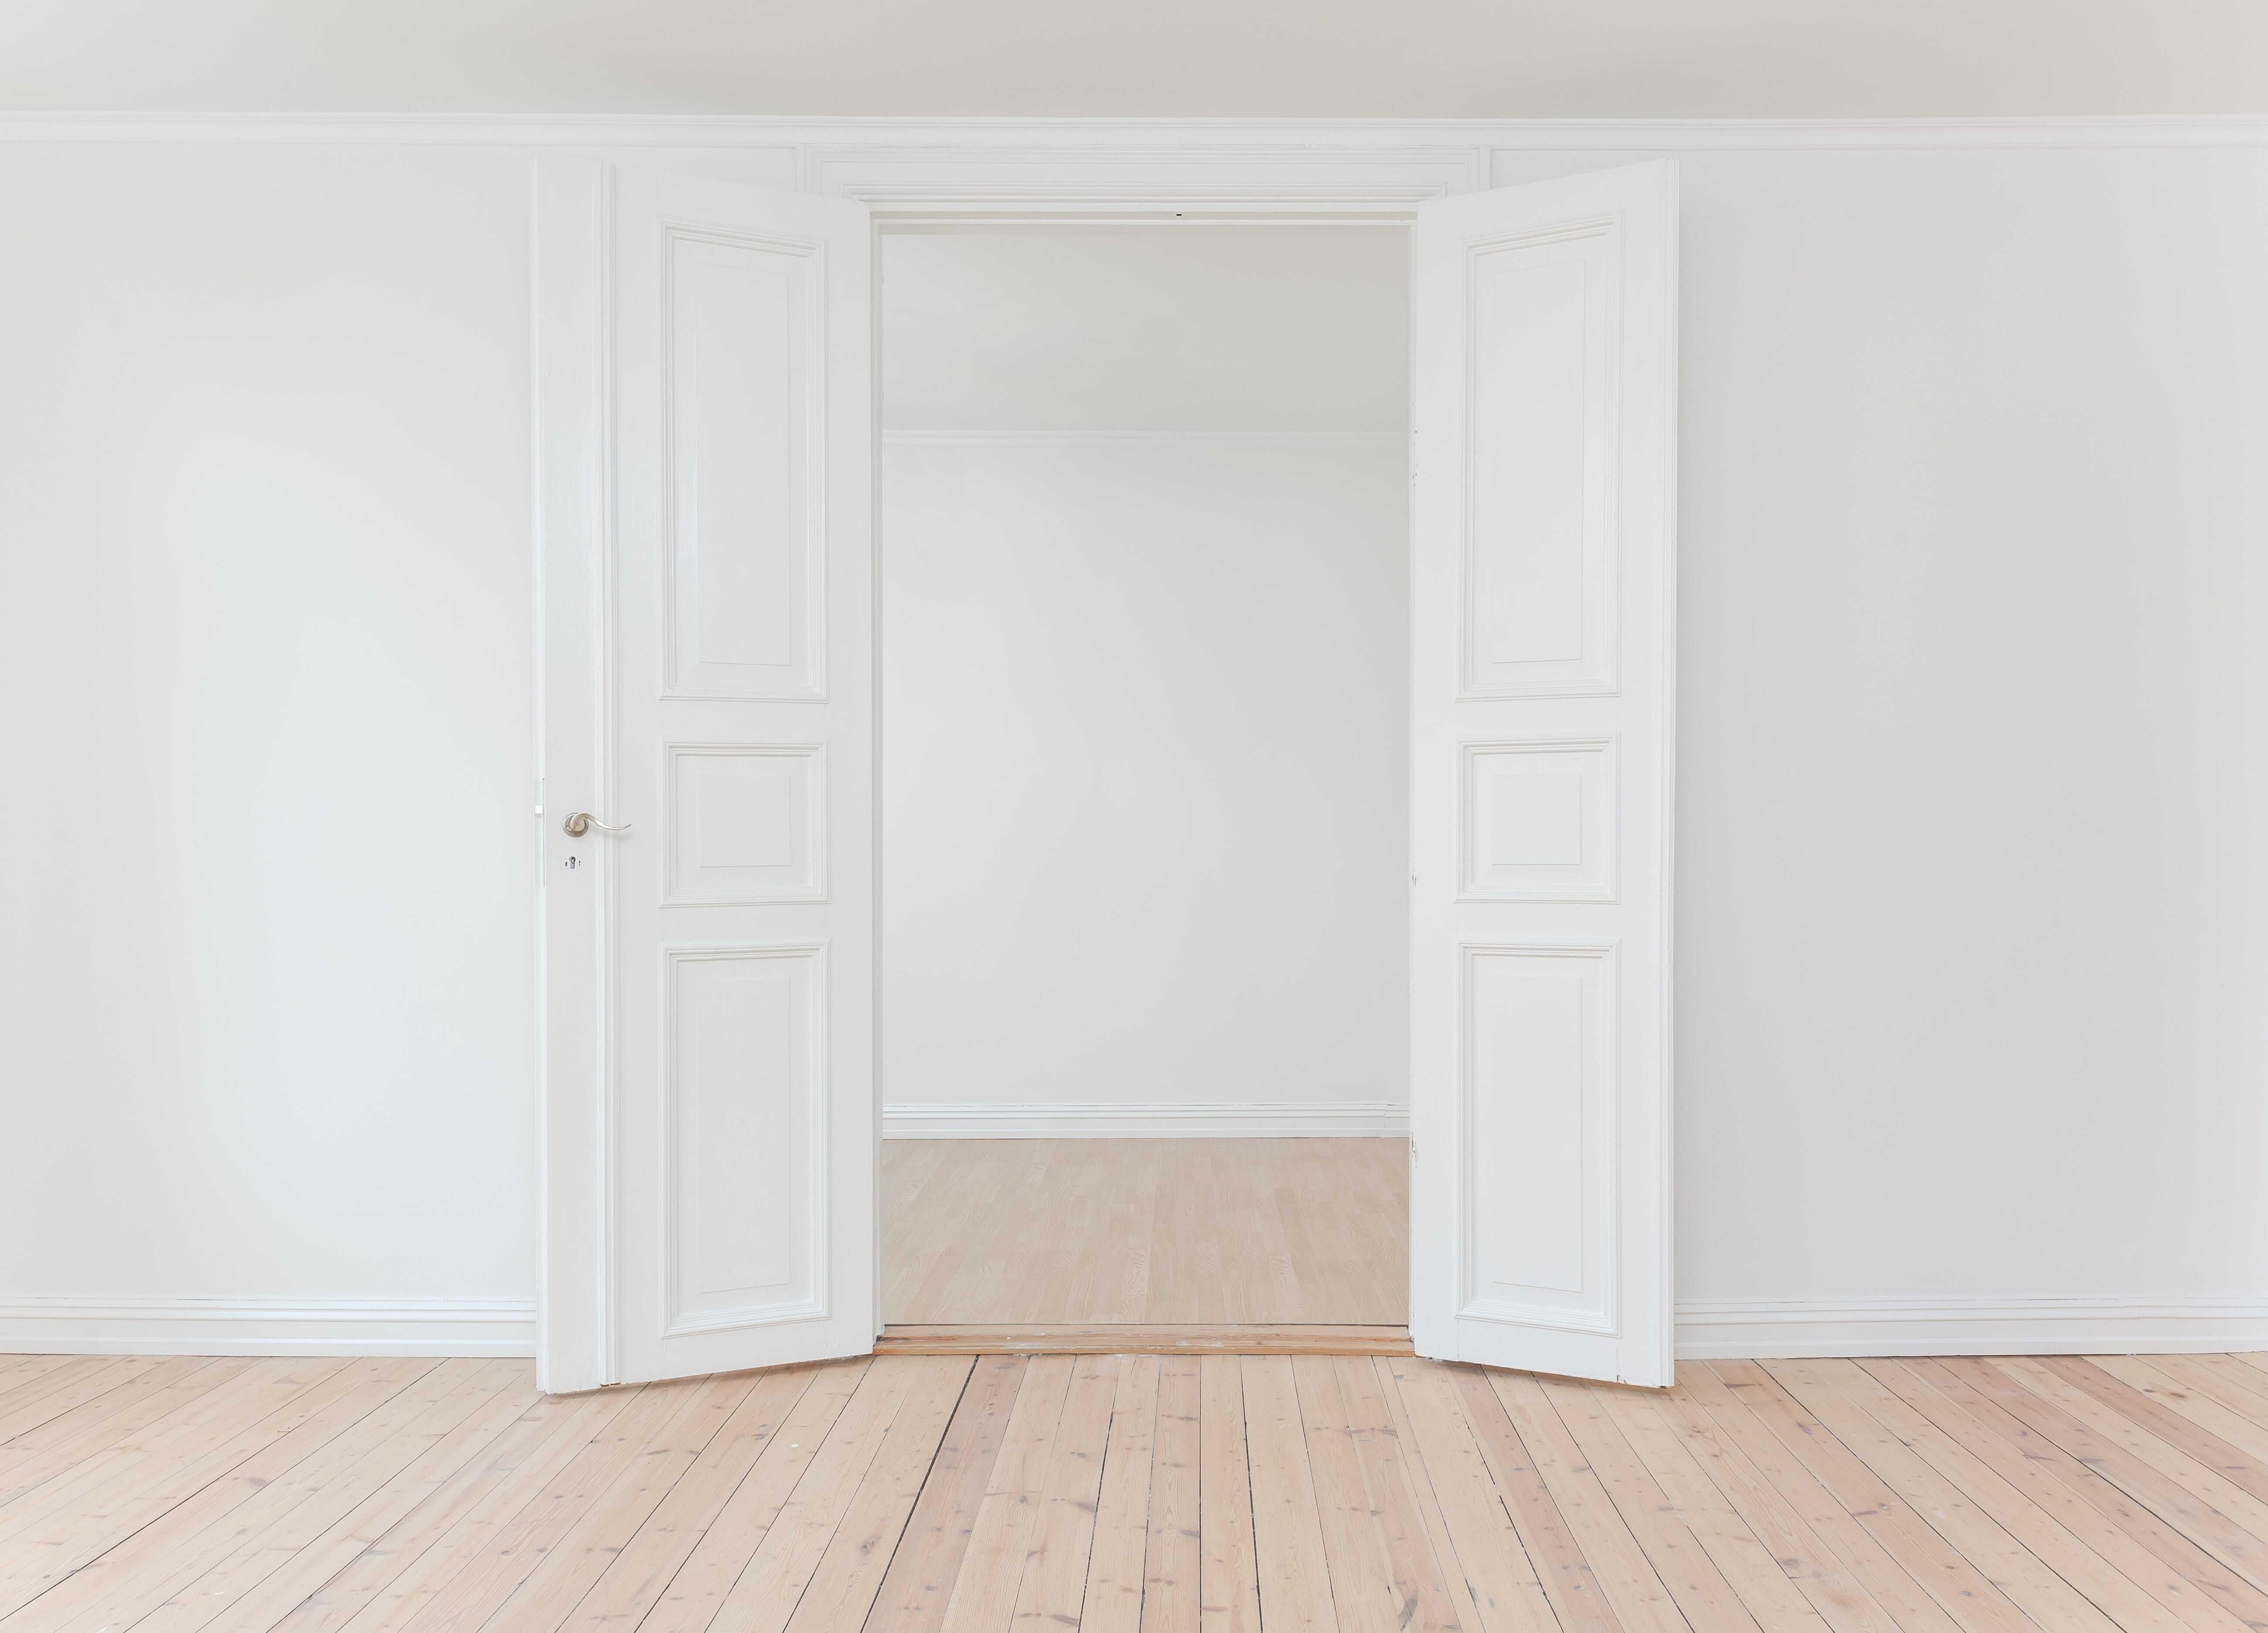 surface blanche avec grande porte ouverte